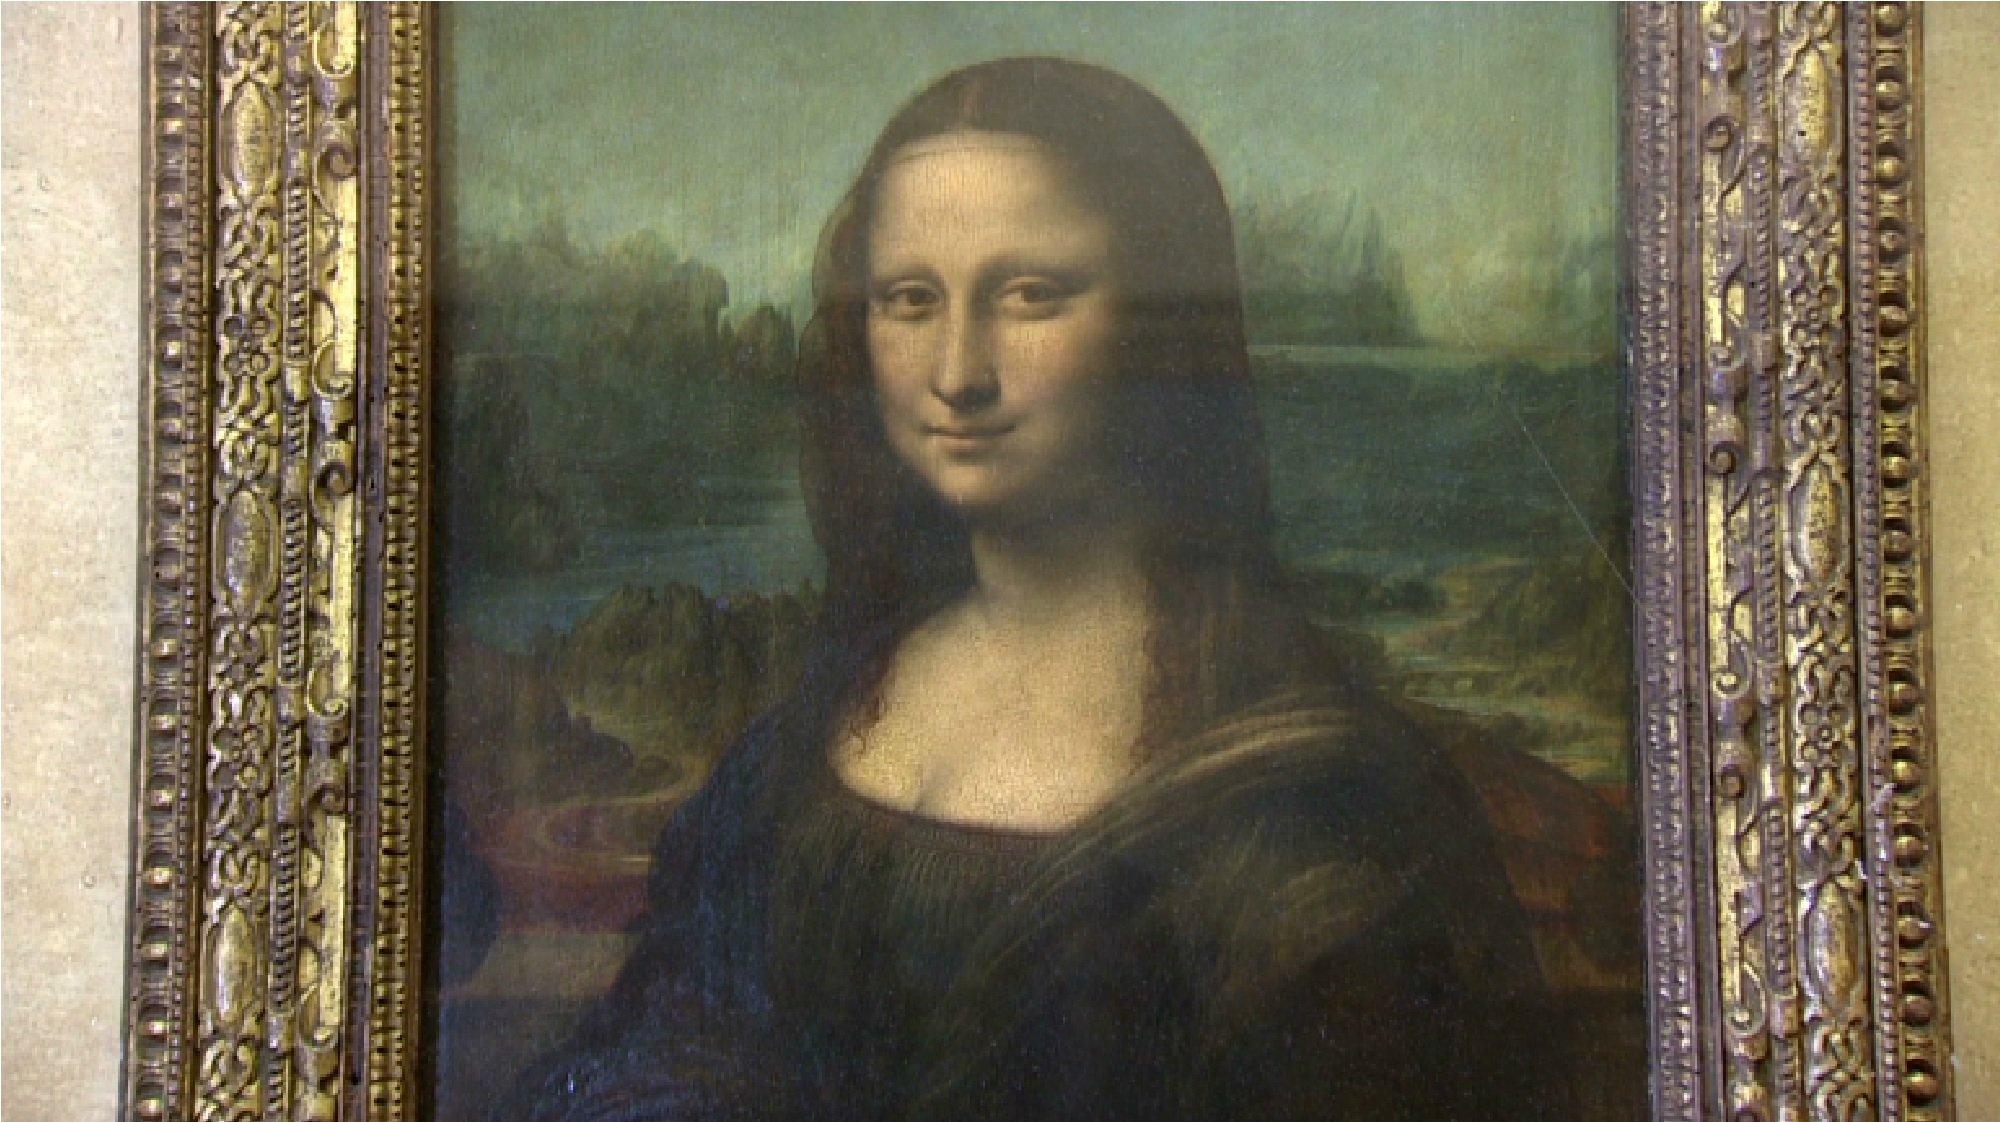 Leonardo da Vinci May Have Drawn a Mona Lisa Nude - The